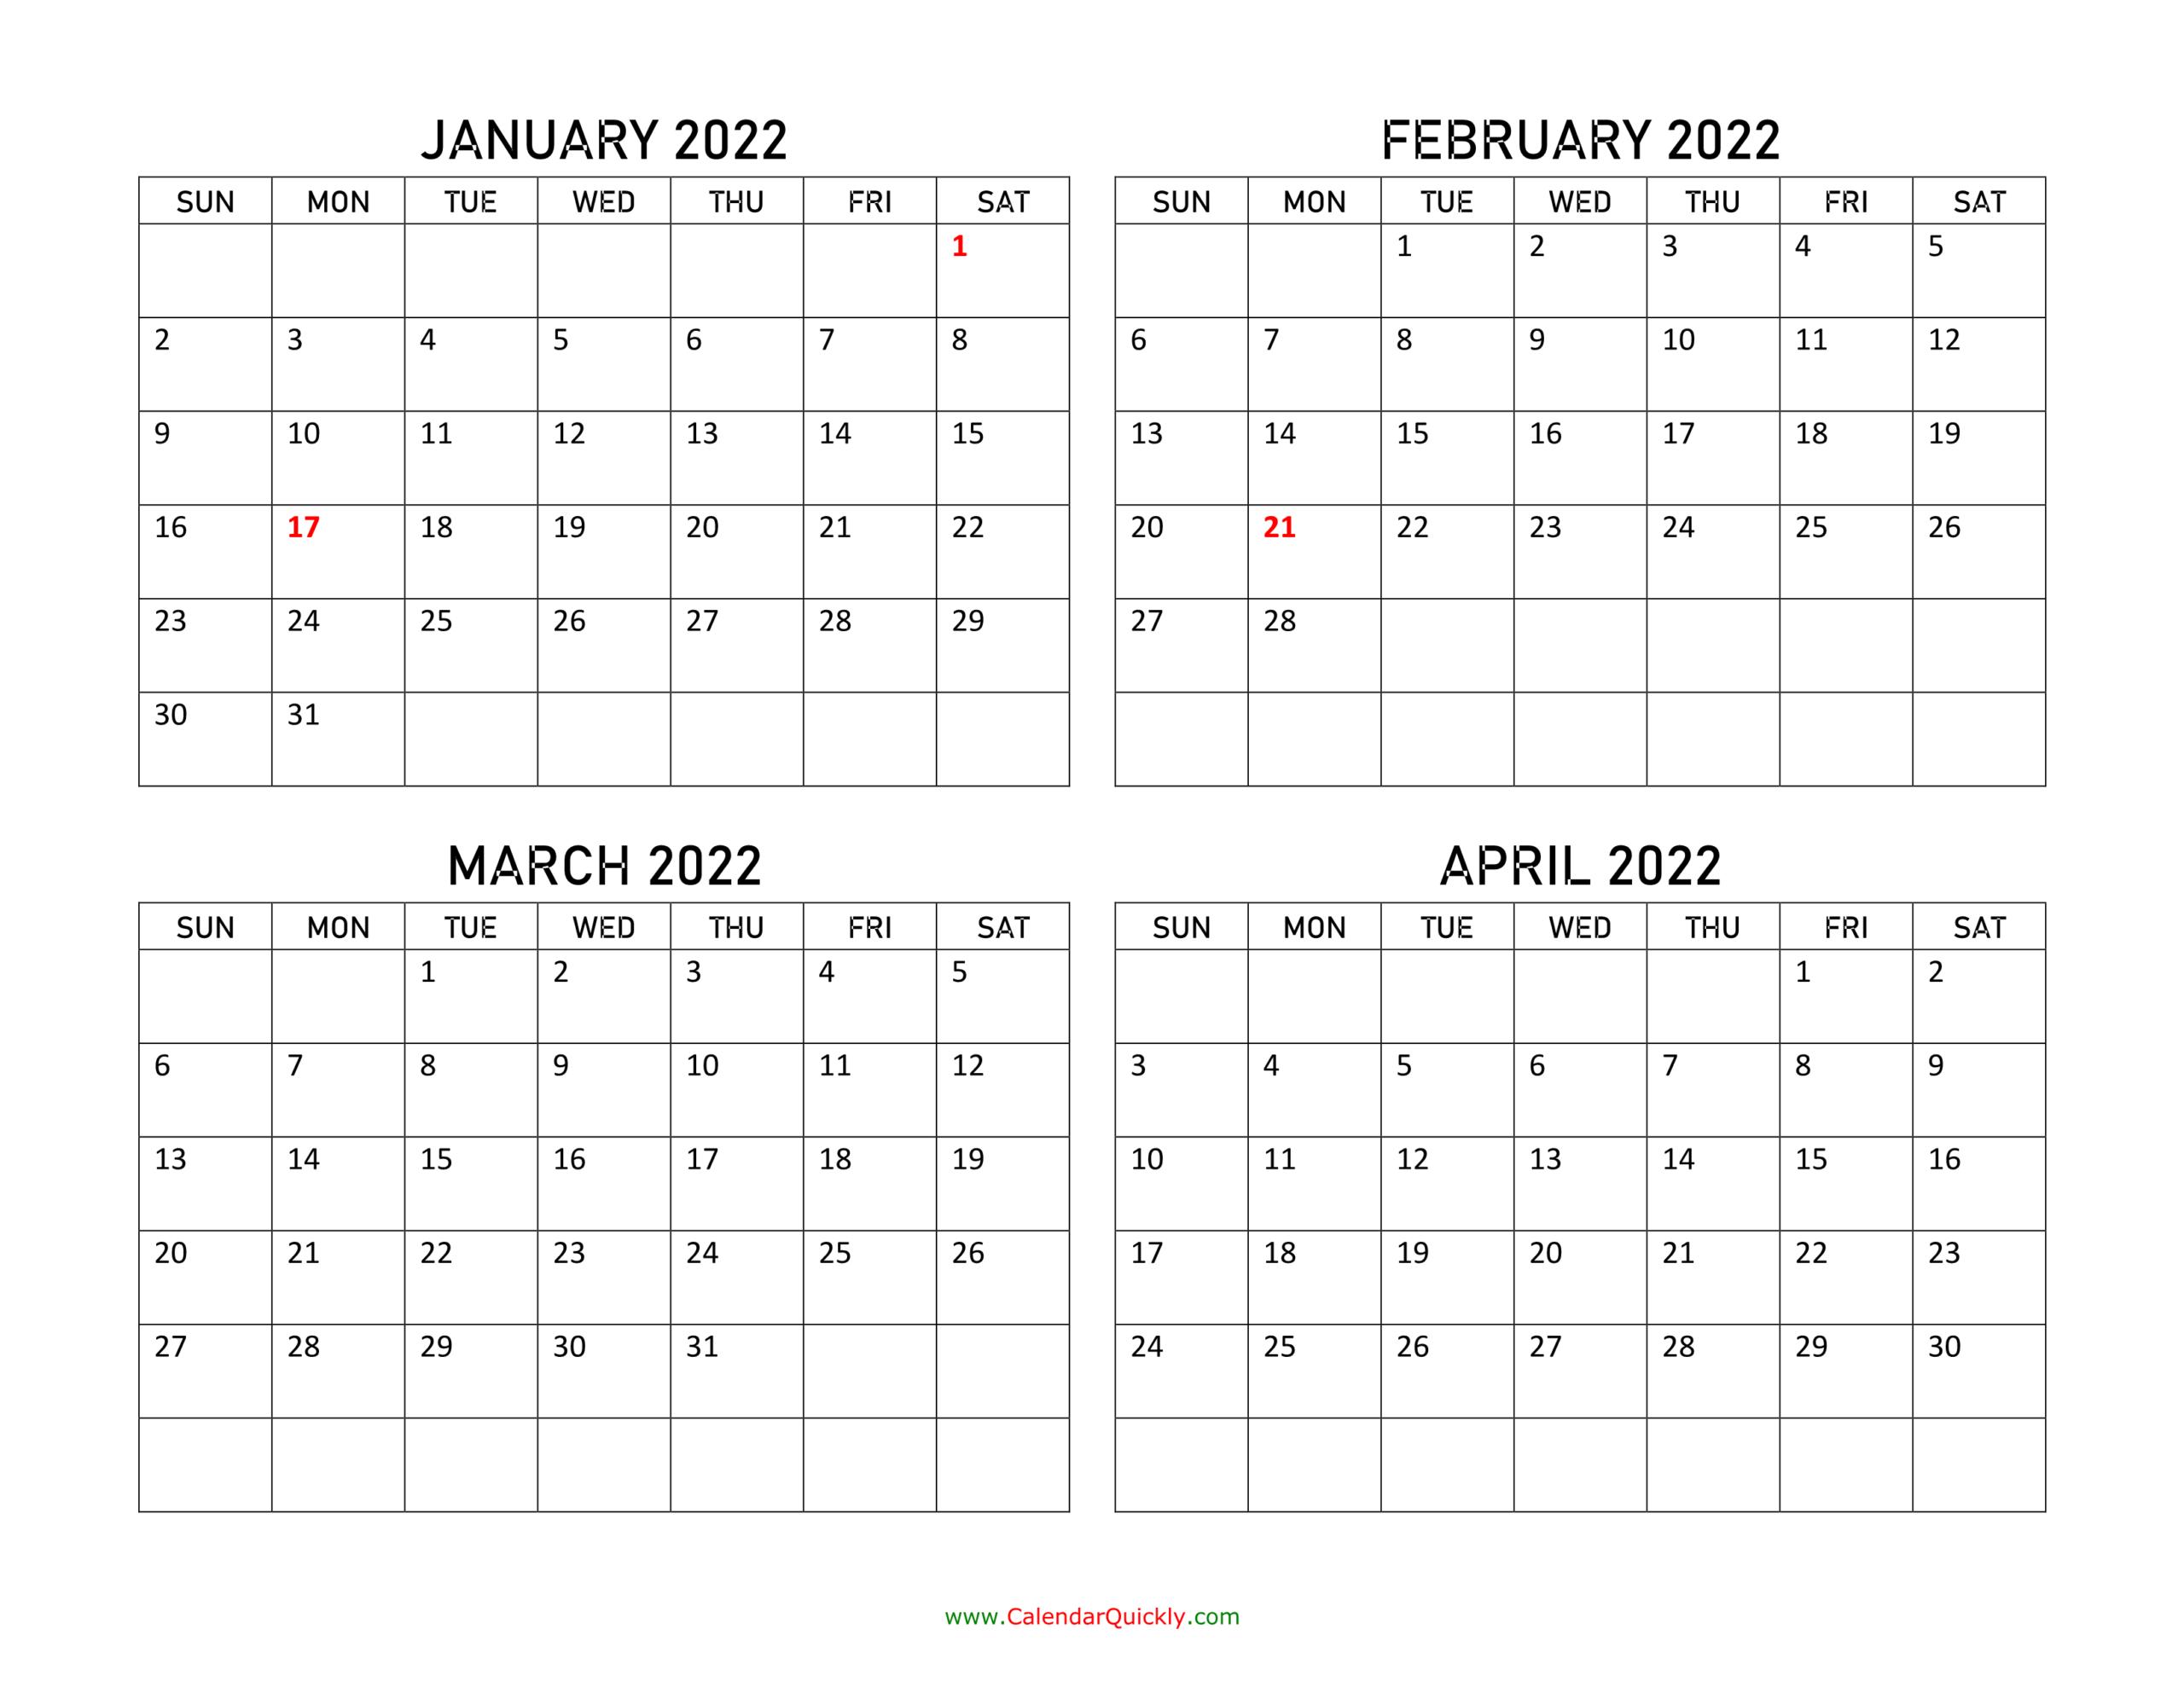 January To April 2022 Calendar | Calendar Quickly inside Printable Calendar January 2022 Floral Image